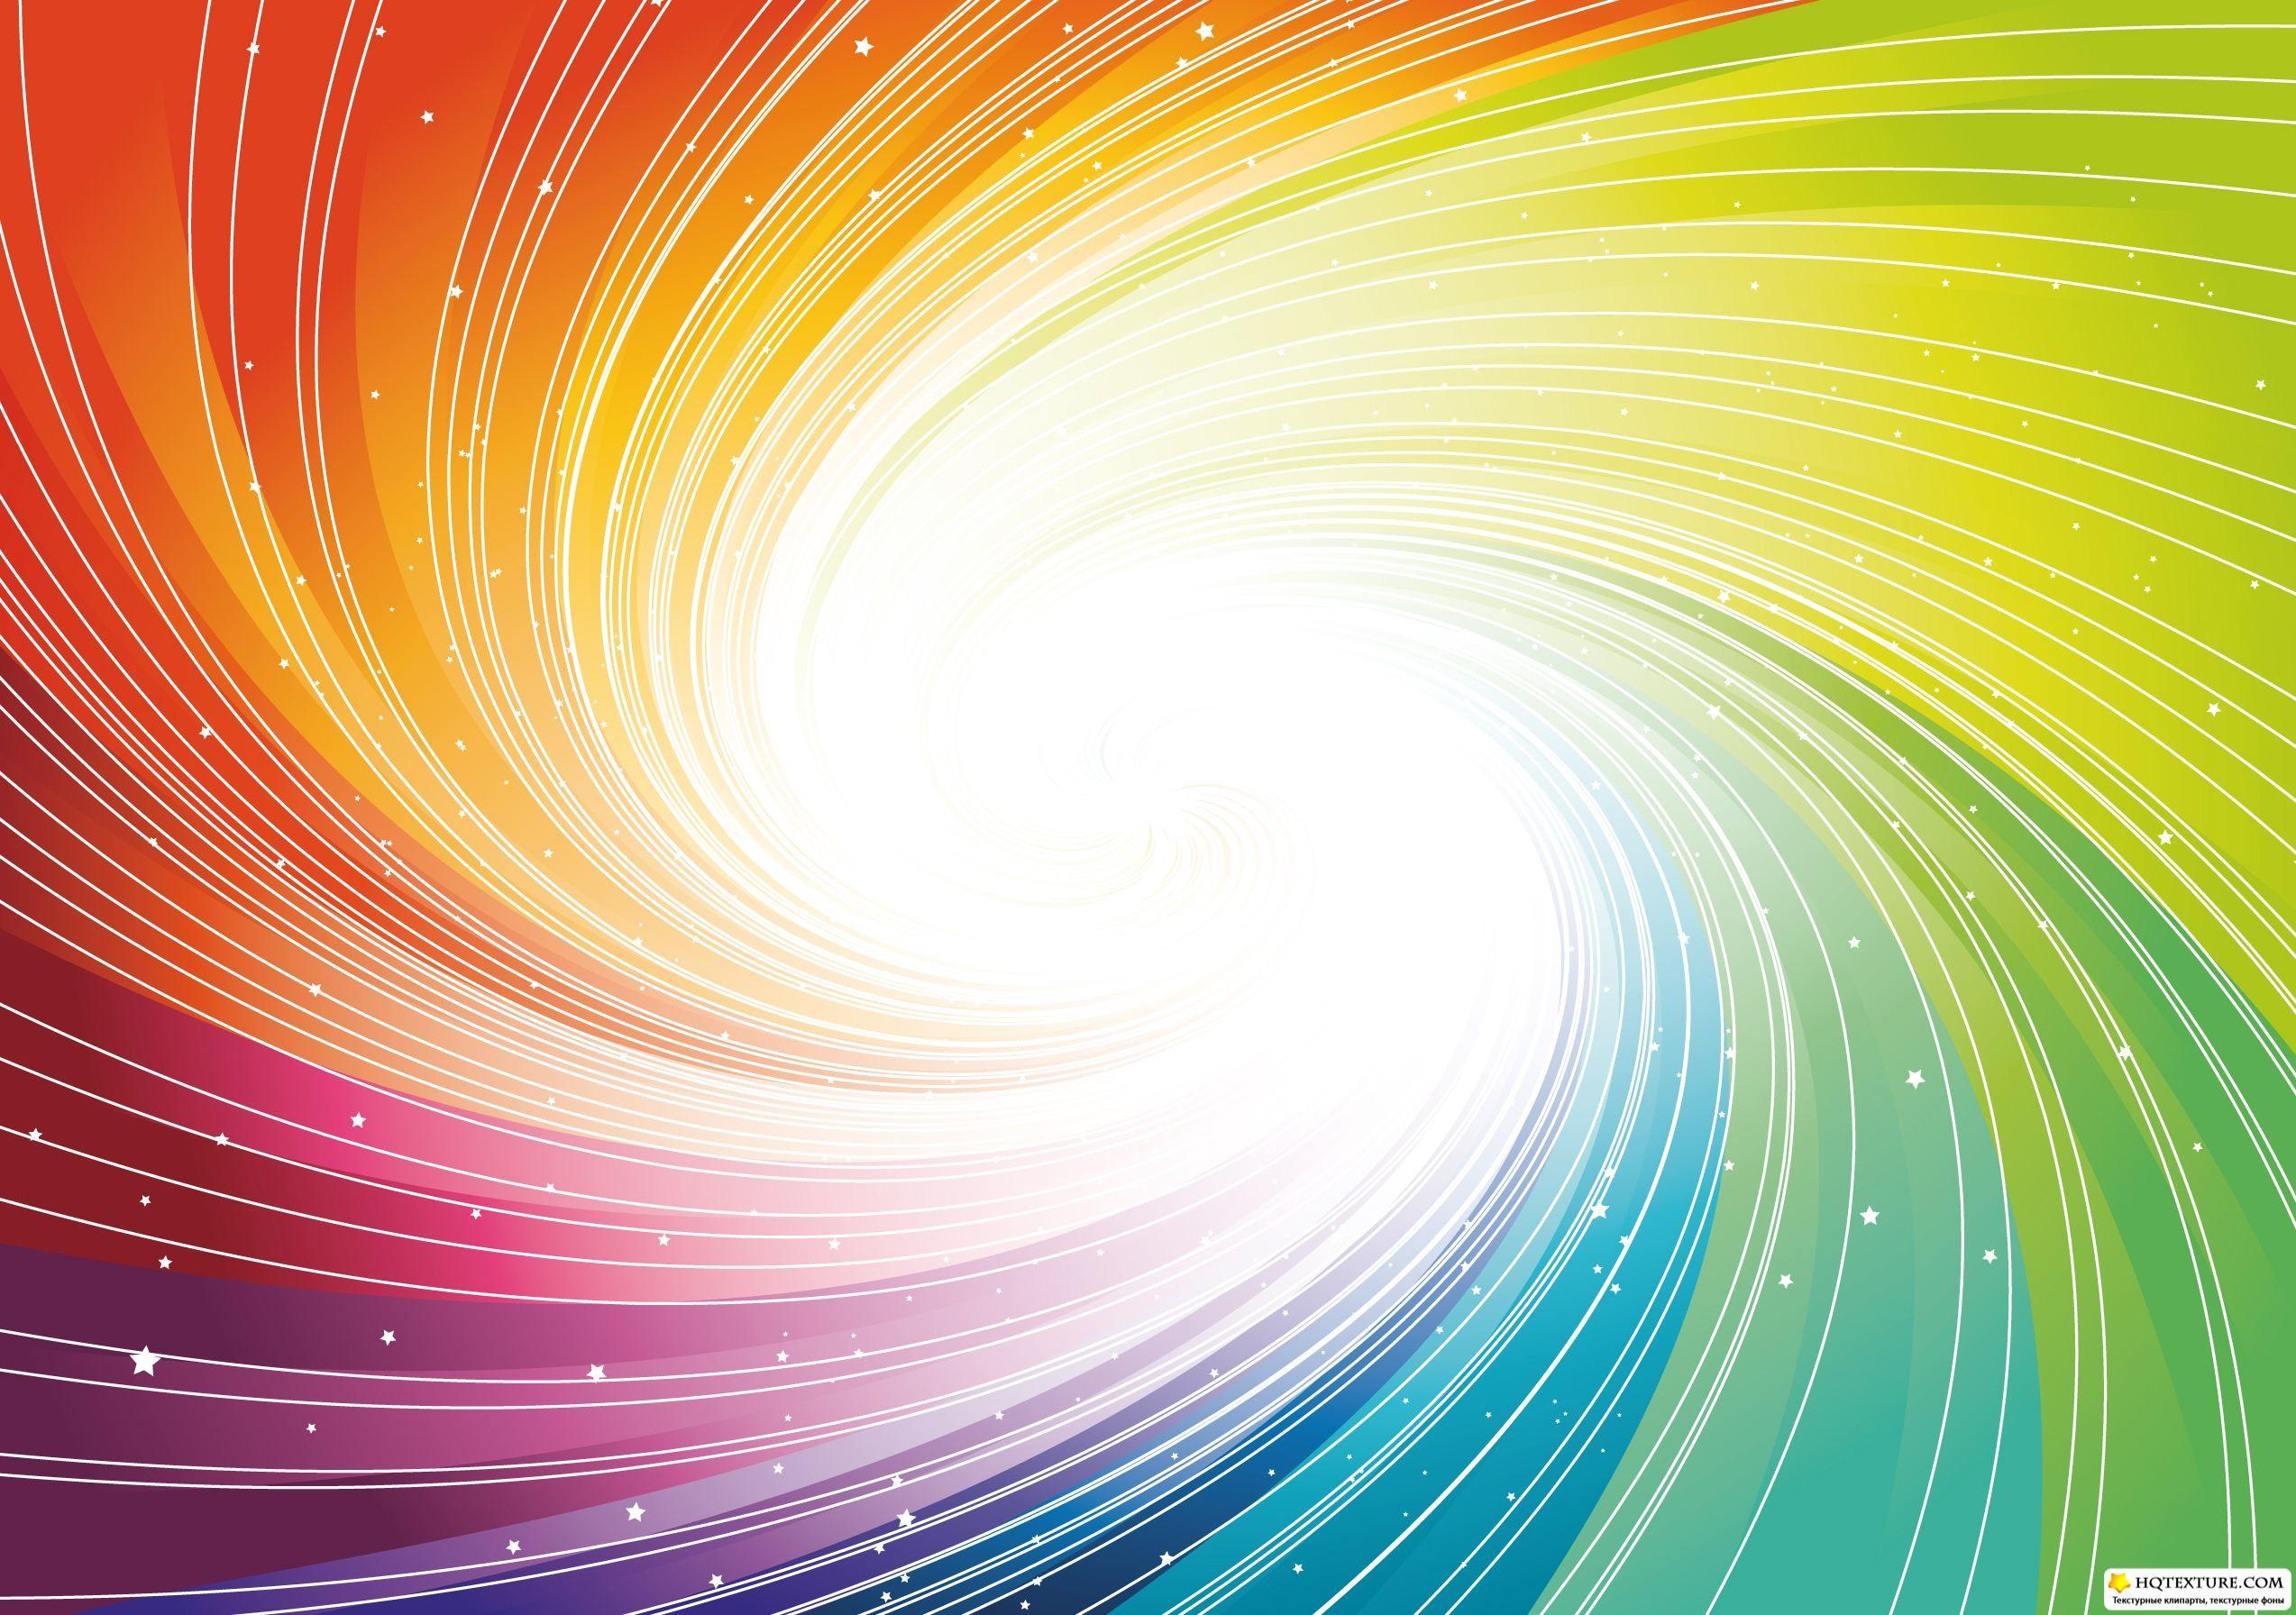 Colorful Backgrounds   Stock Vectors – Colorful backgrounds   Цветные фоны 2